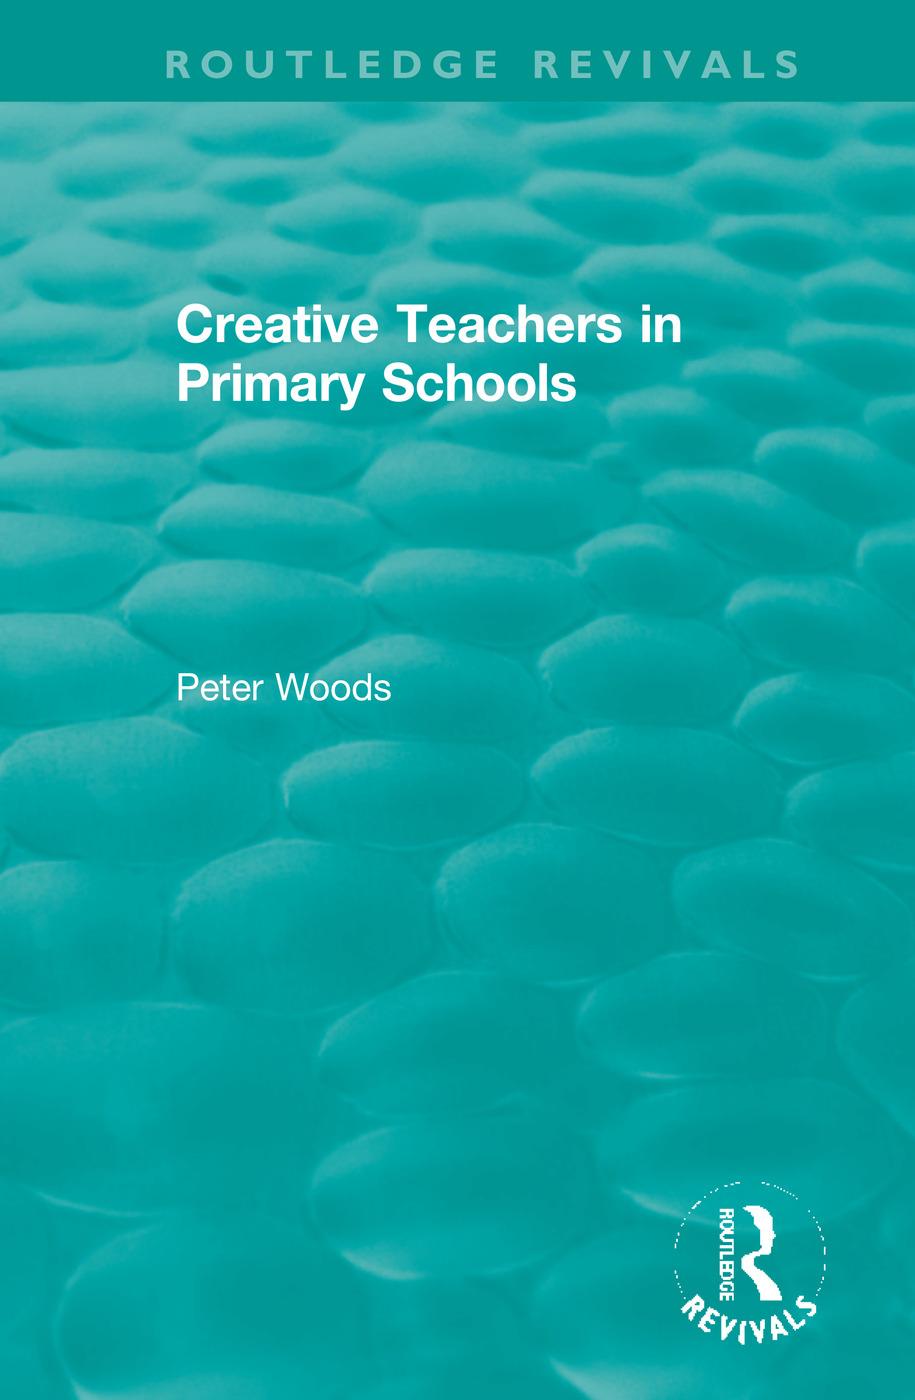 Creative Teachers in Primary Schools book cover